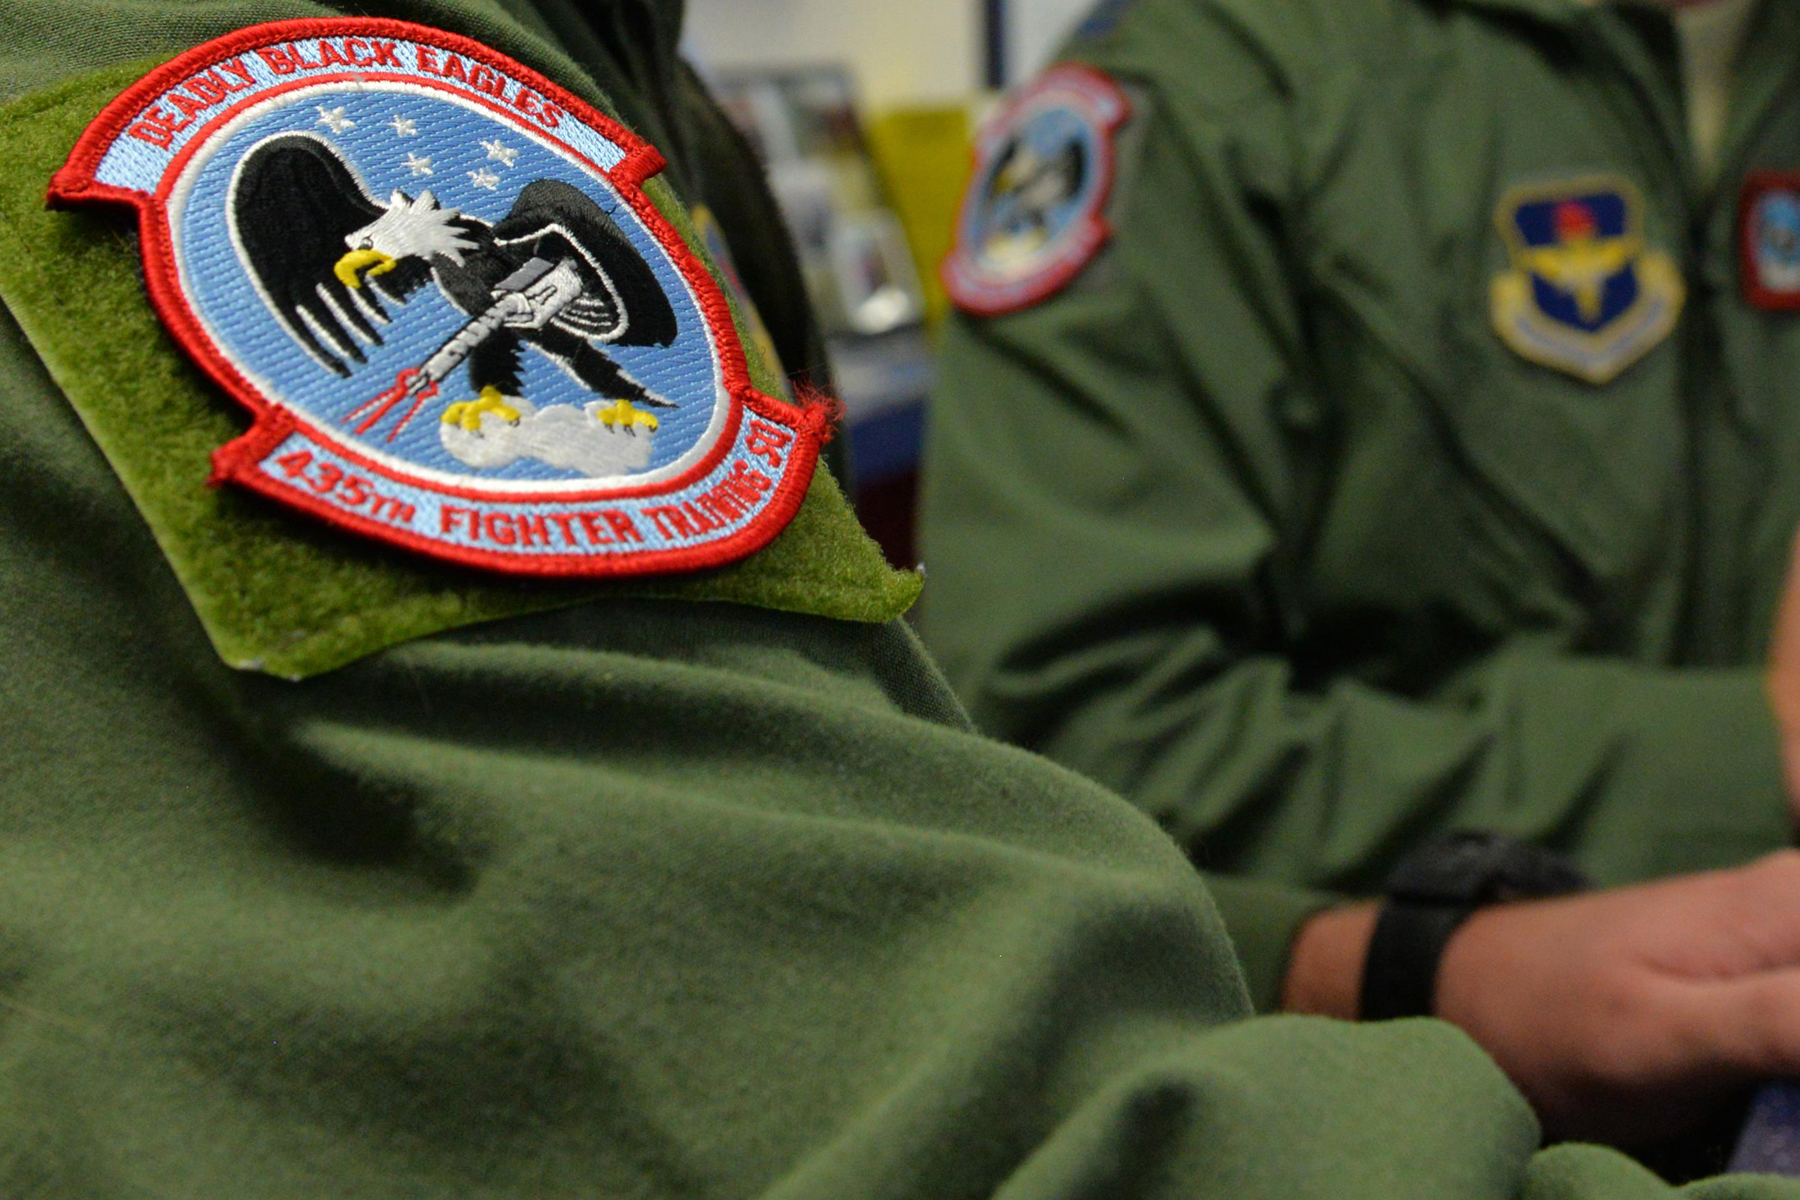 Retired Black Officer, Black Air Force veteran killed so Badly, in possible hate crime: DA Revealed